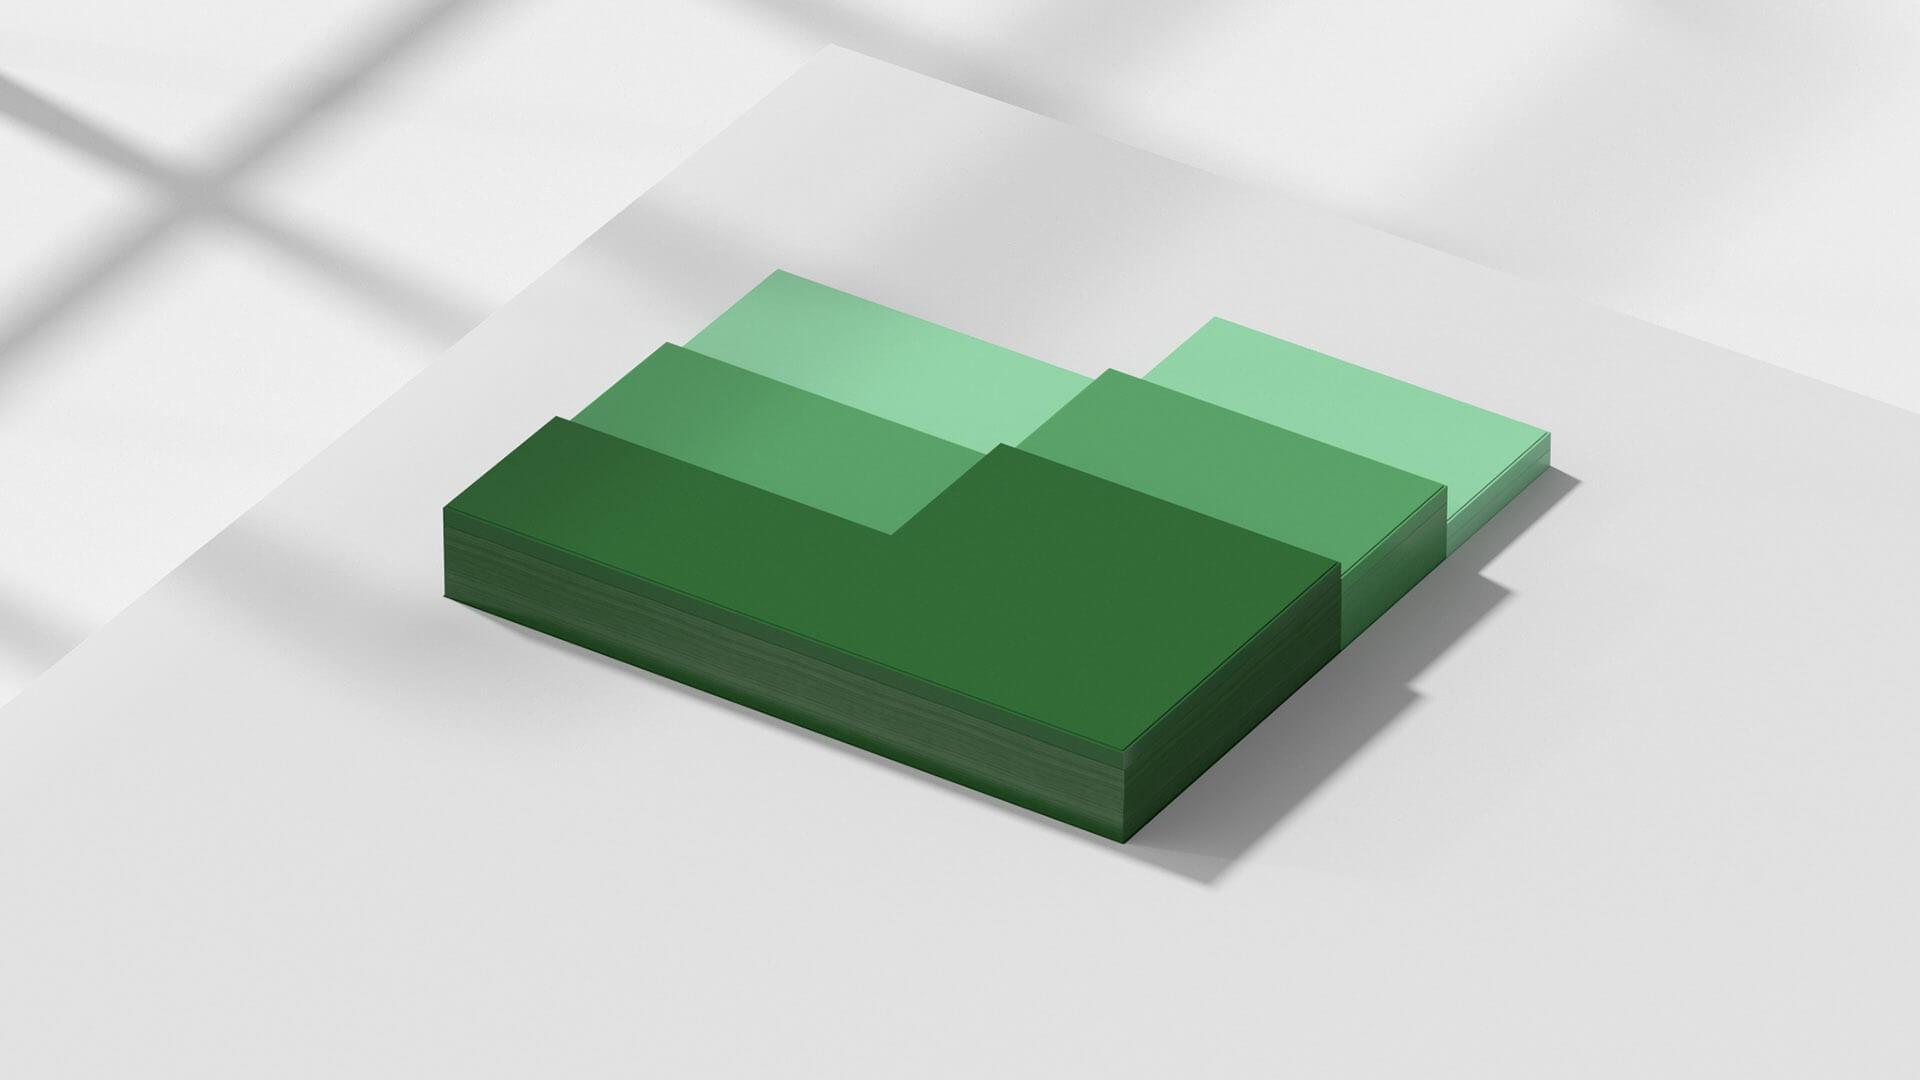 Excel Pedestal 1080p wallpaper